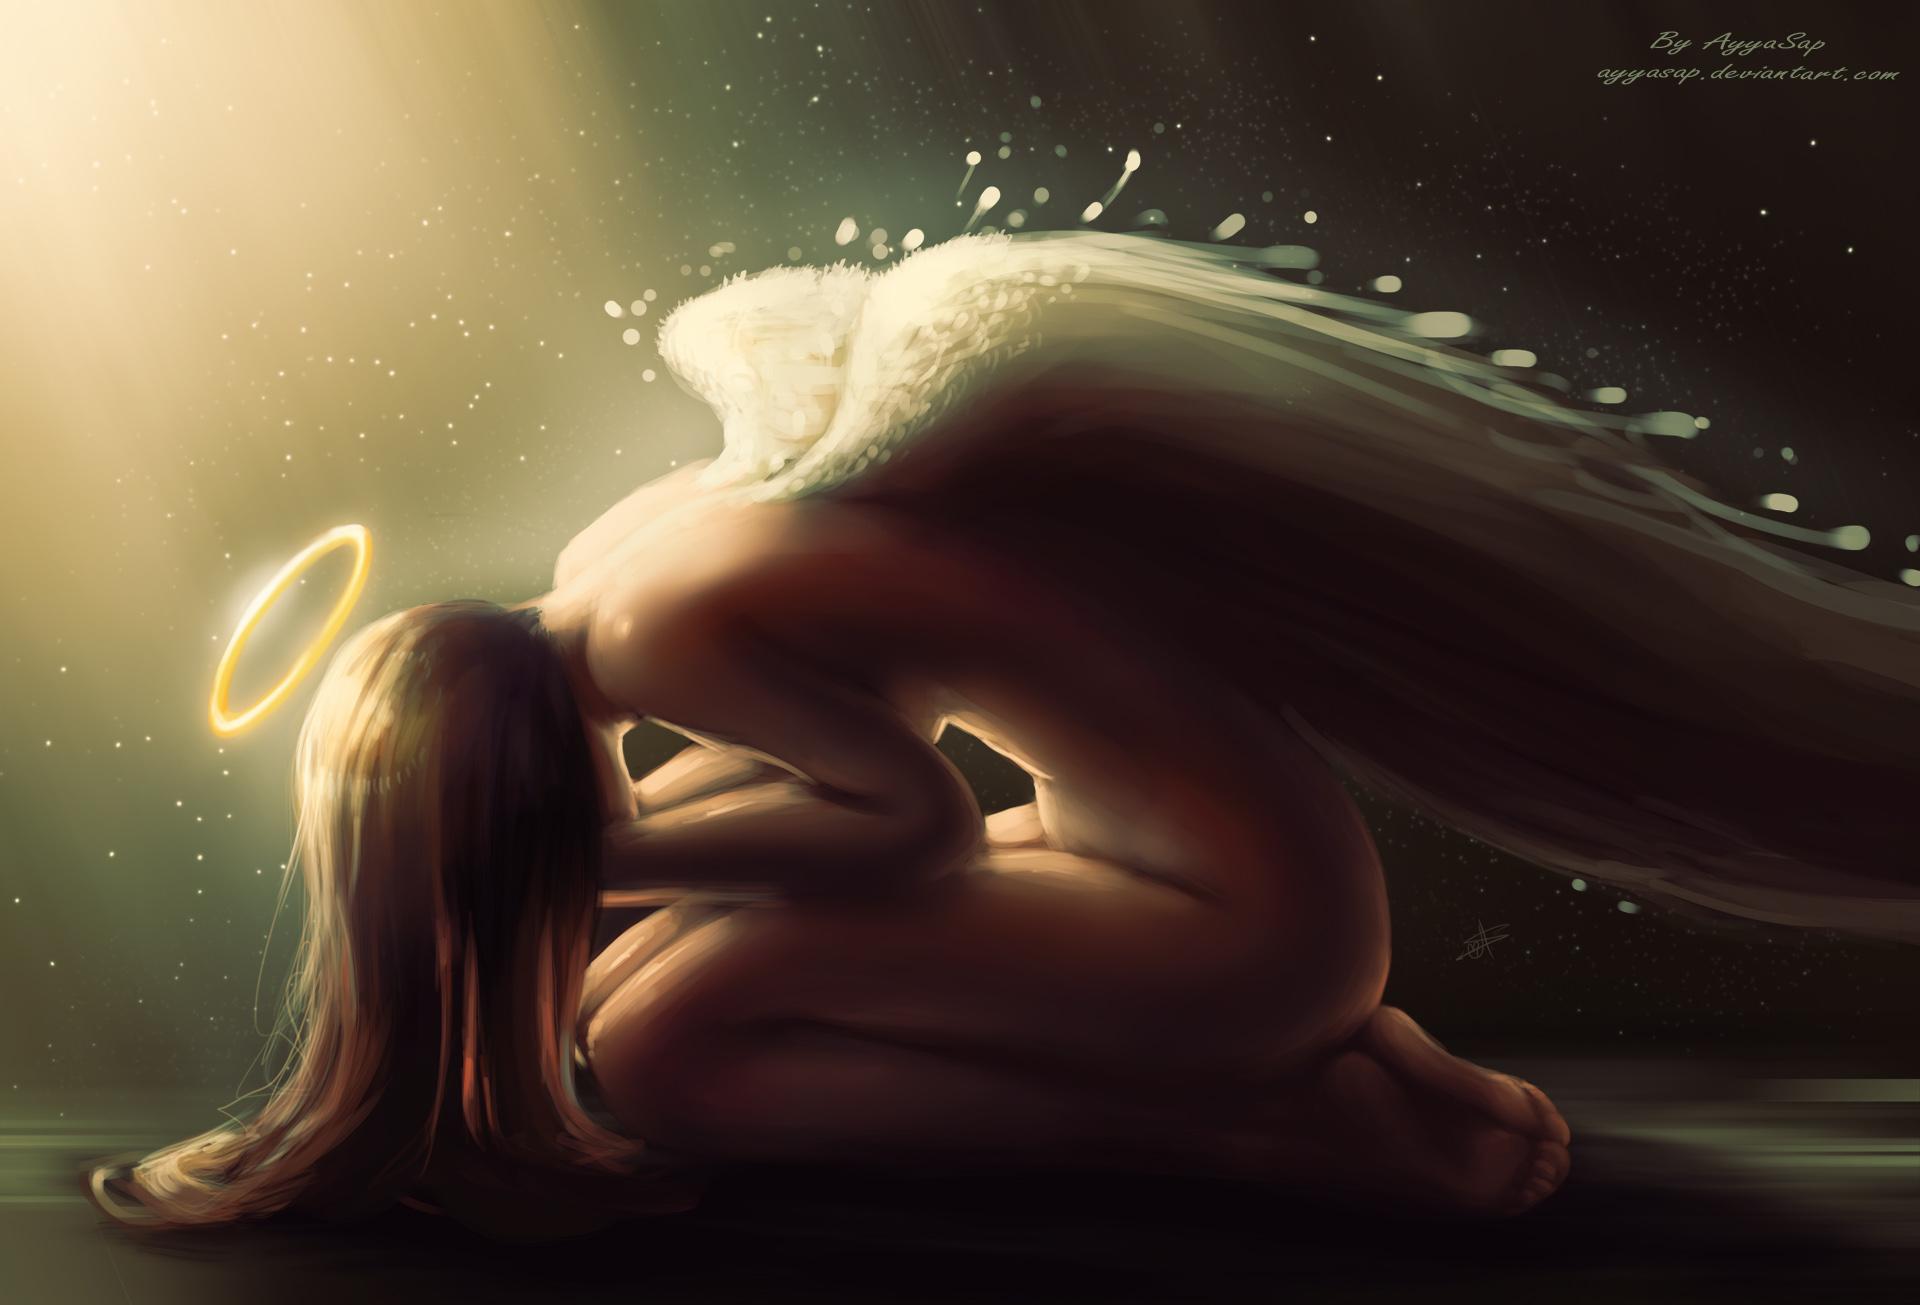 Sad Angel Paintings Sad Angel by Ayyasap